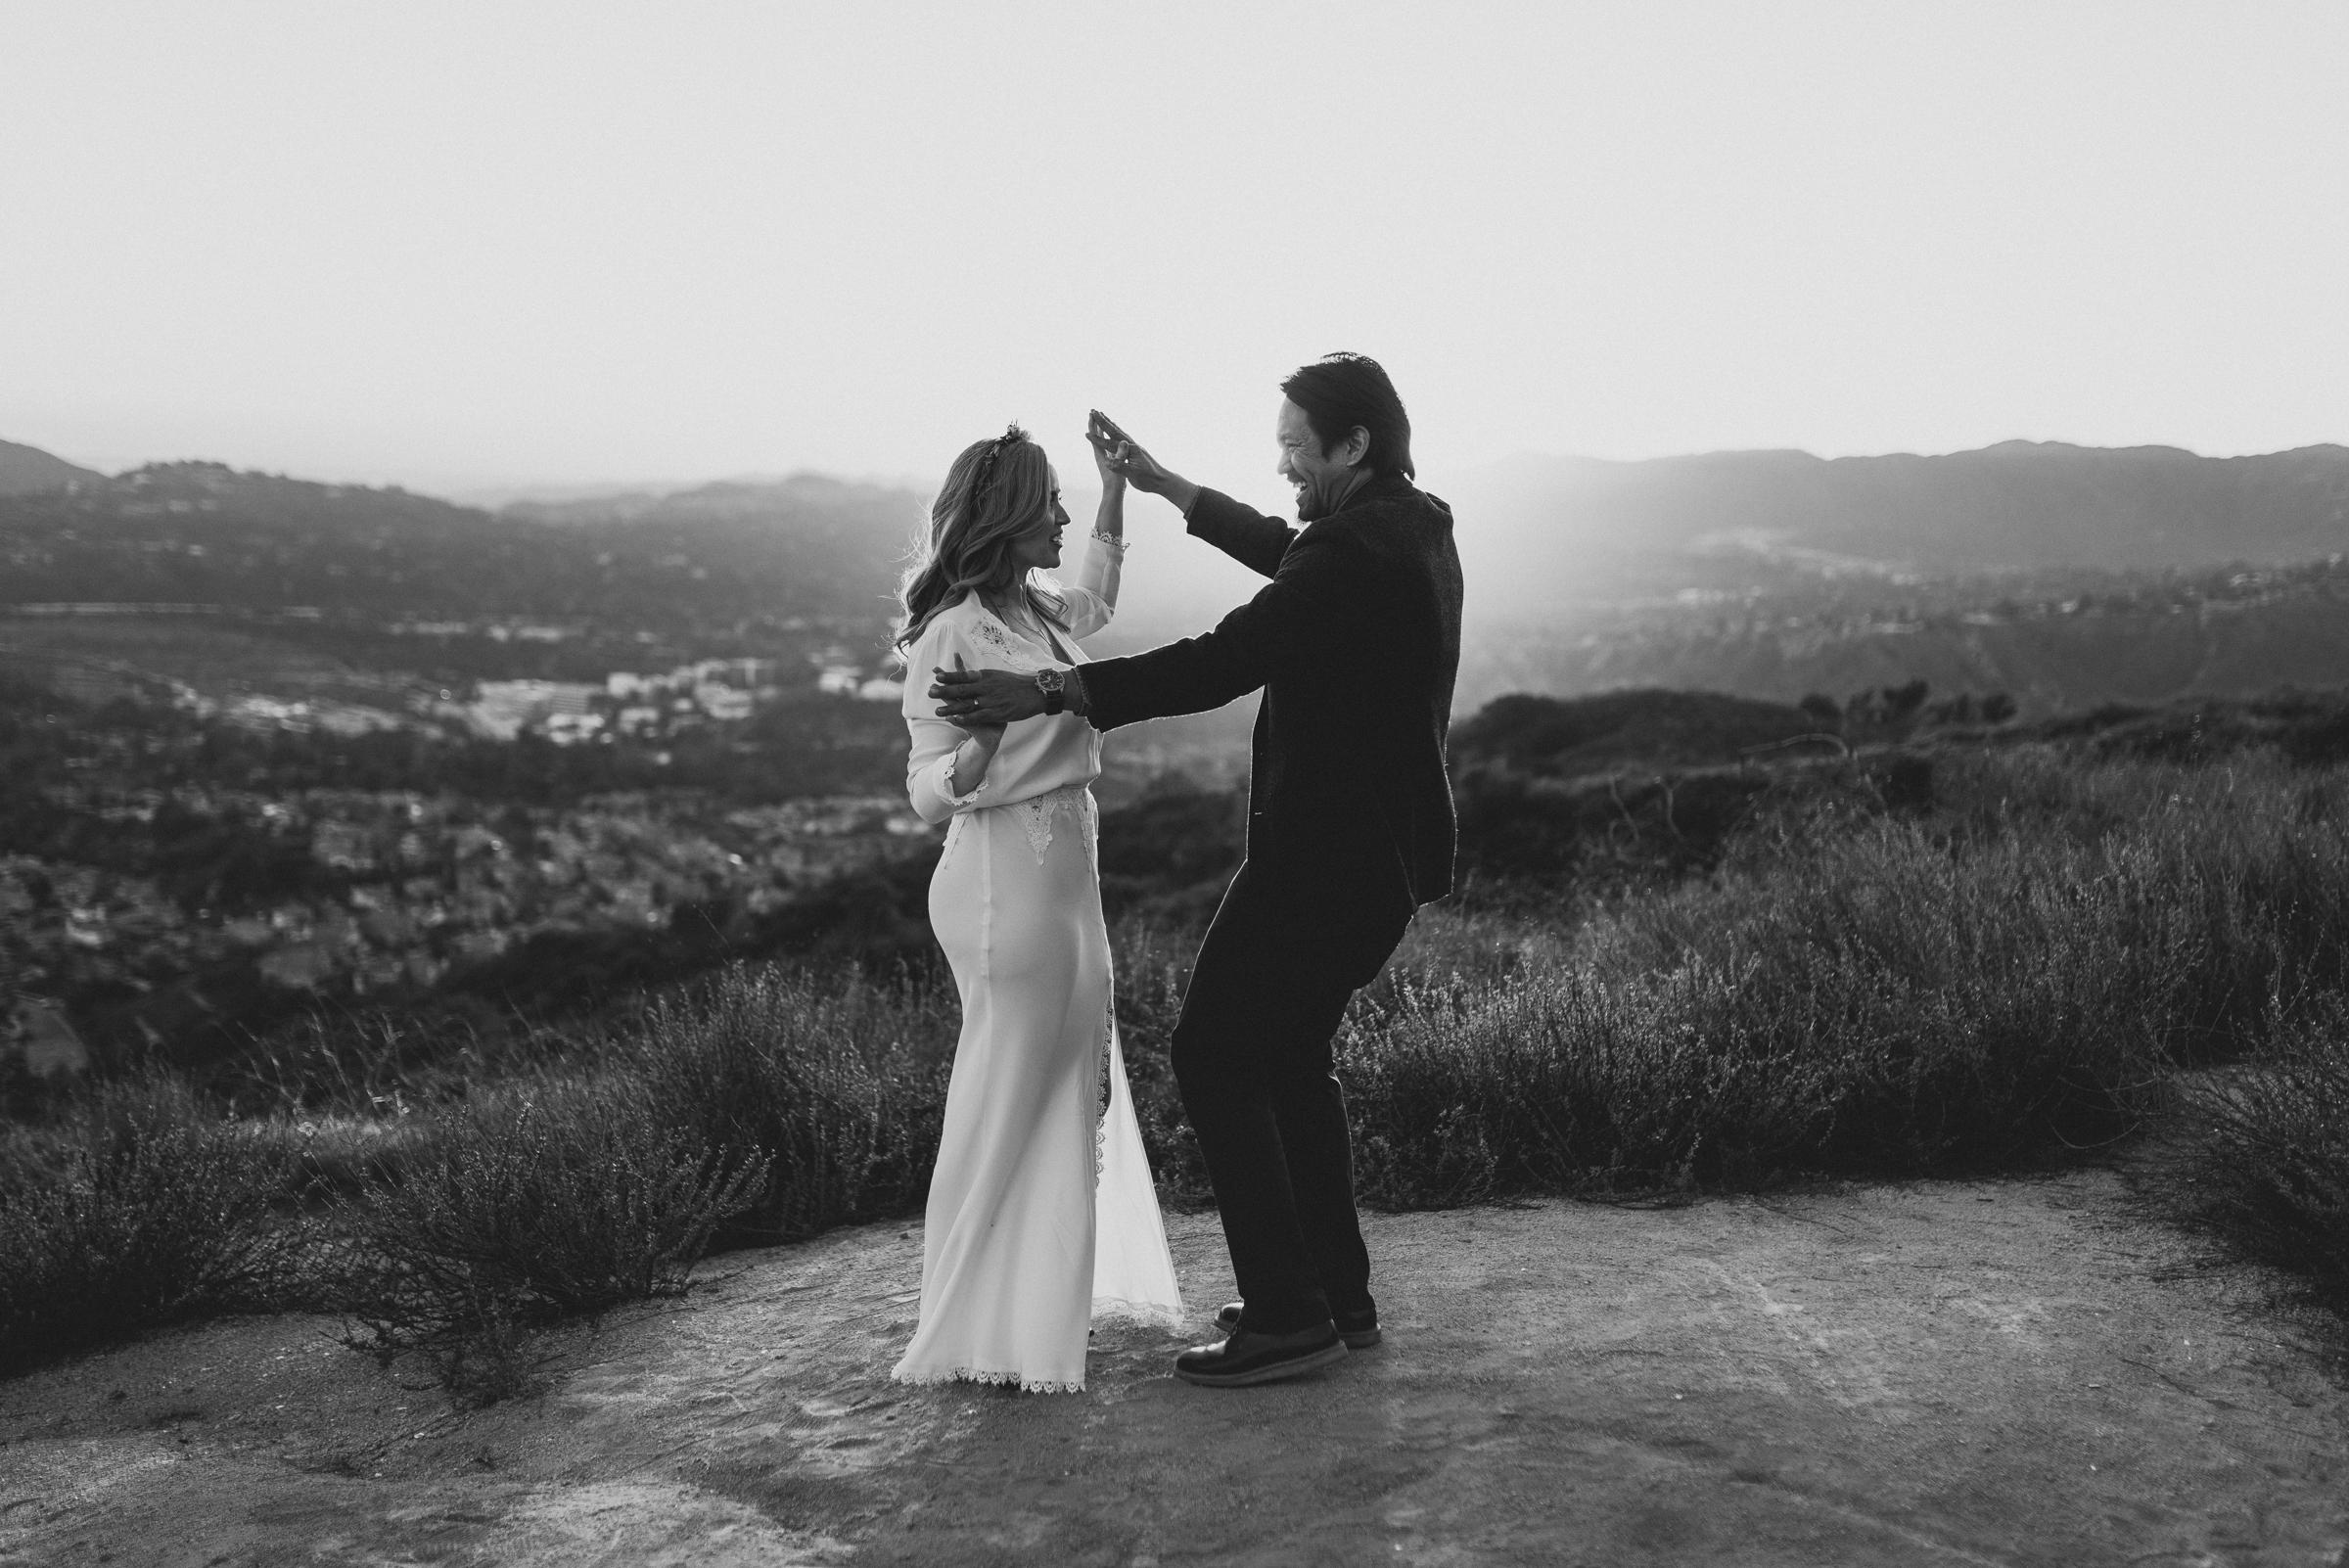 ©Isaiah + Taylor Photography - Intimate Elopement, Eaton Canyon, Los Angeles Wedding Photographer-101.jpg